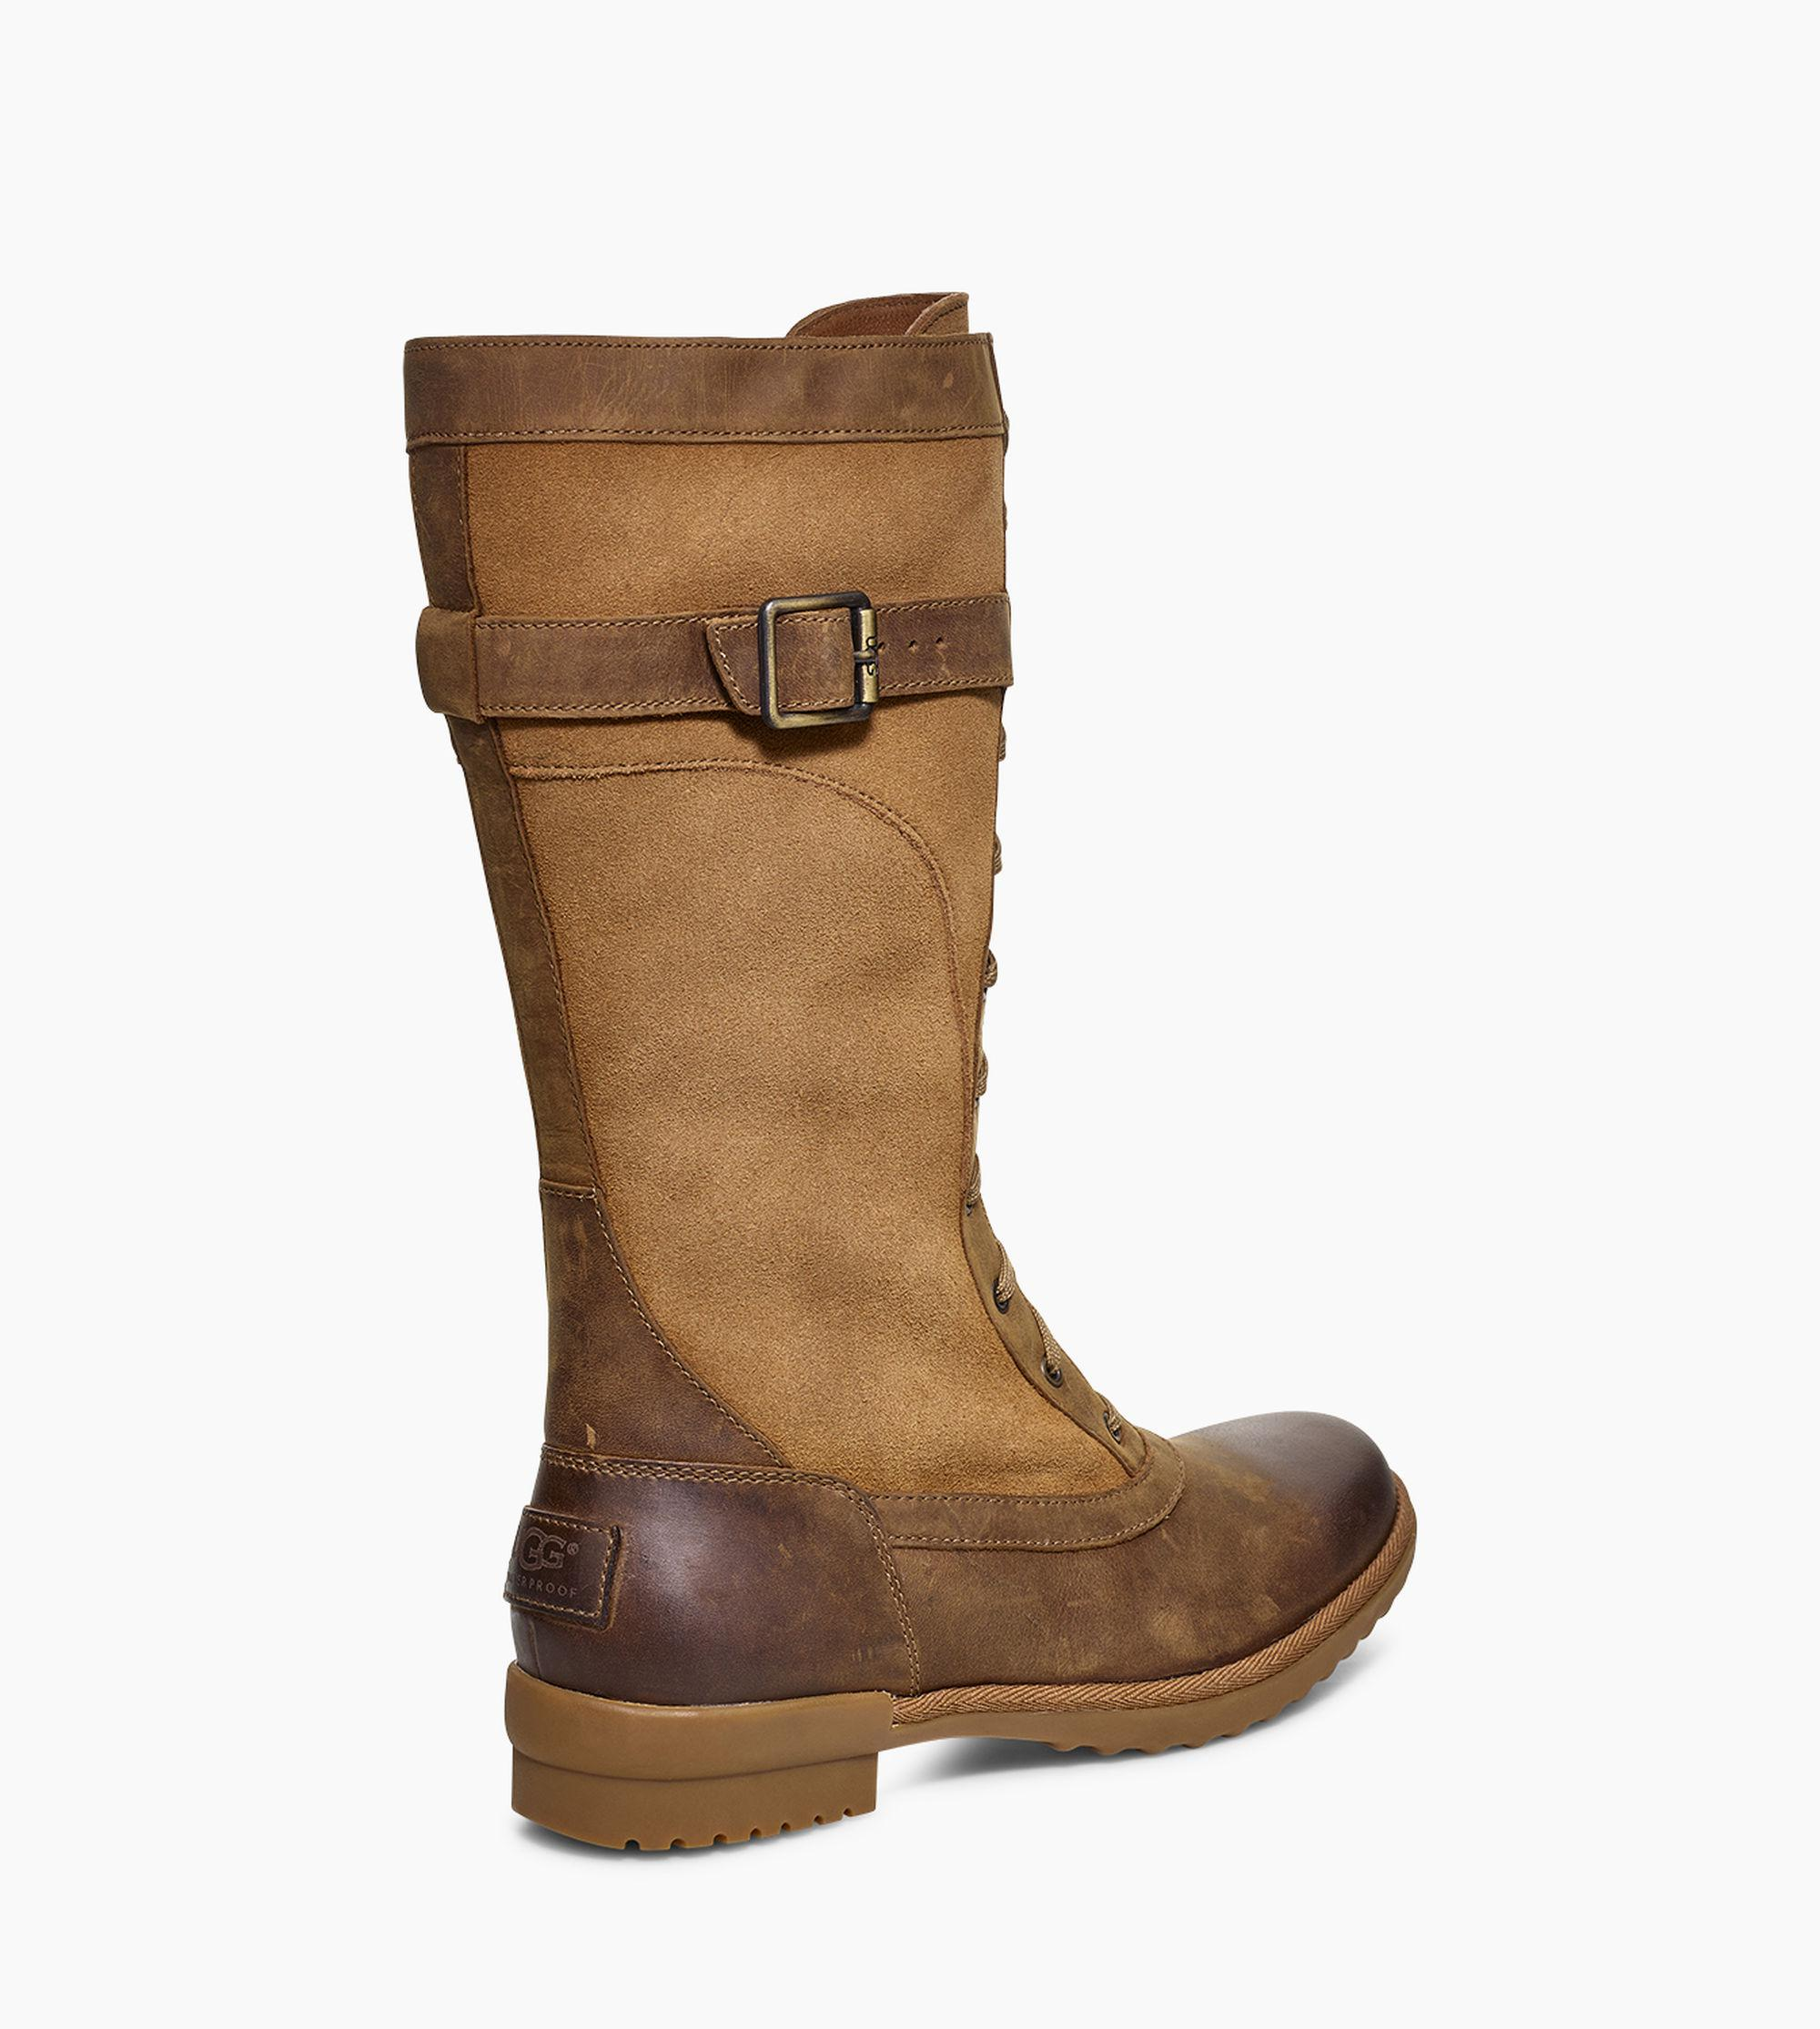 Brystl Waterproof Insulated Boot